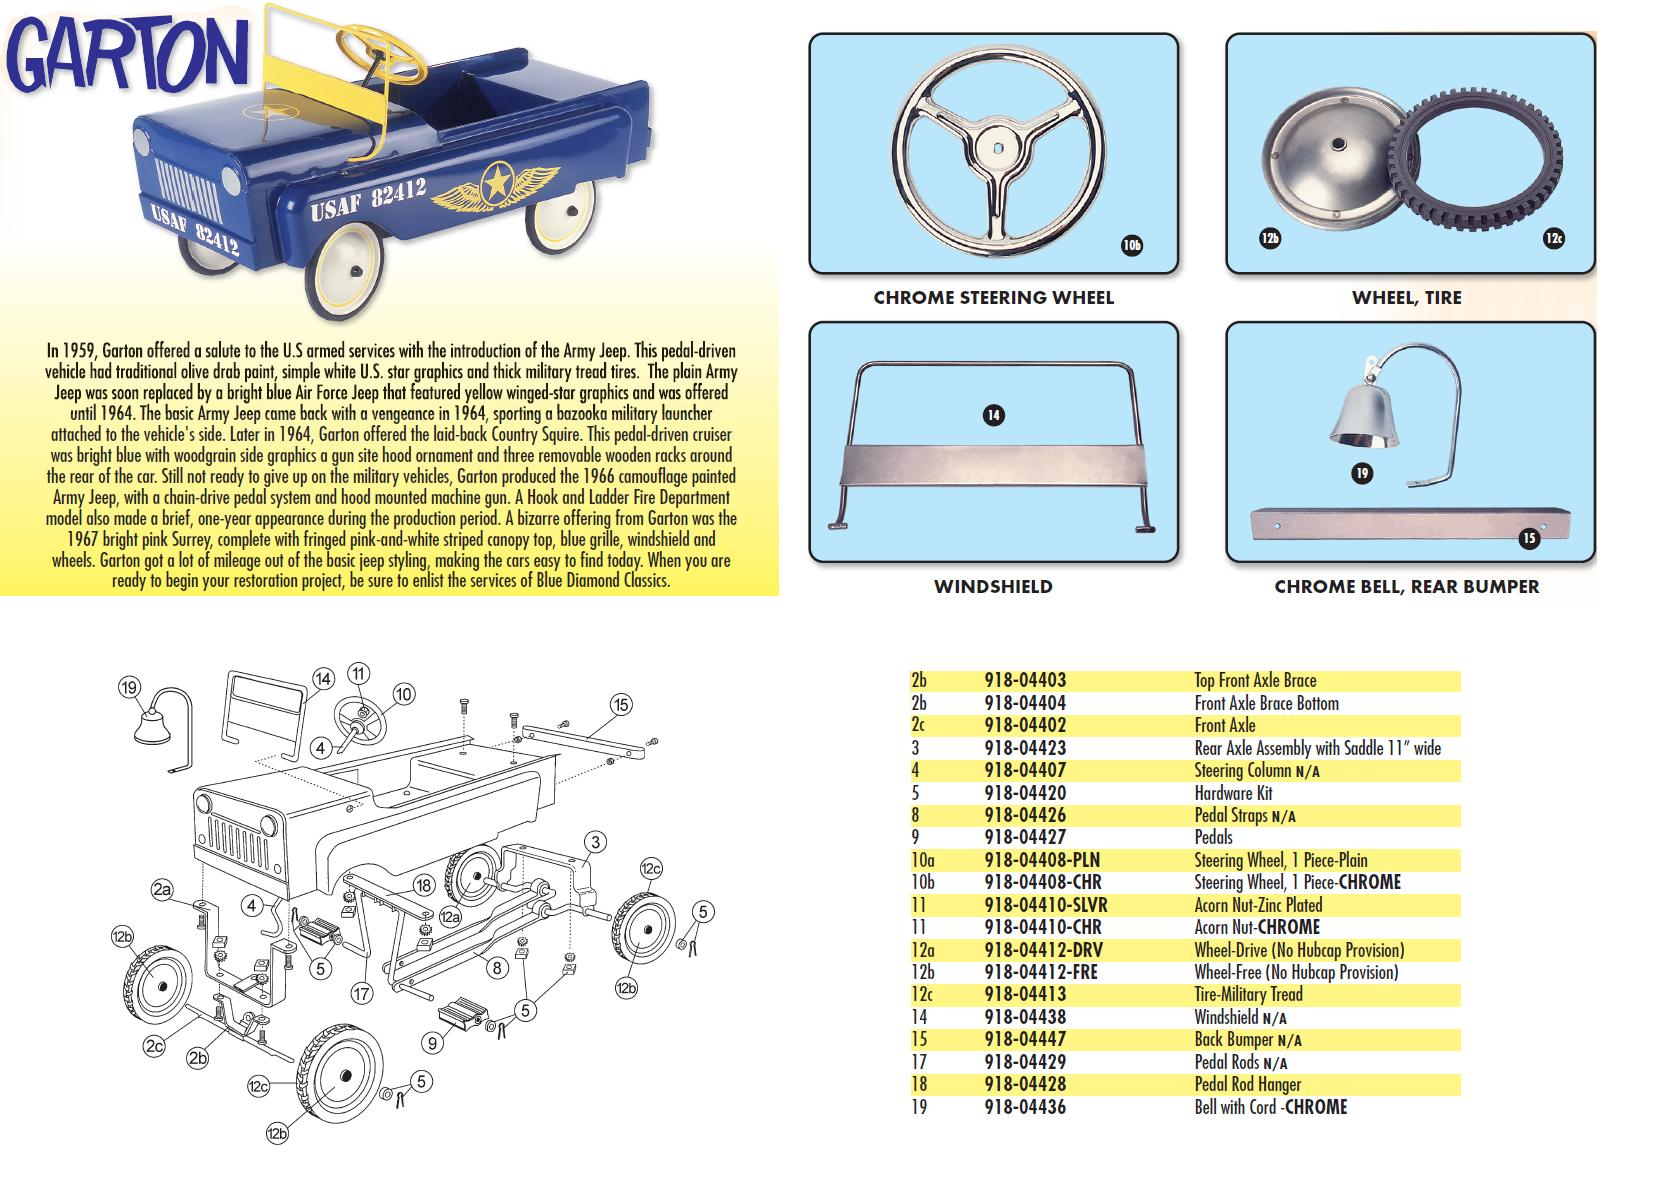 Pedal Car Parts, Garton Jeep Front Axle Brace, Bottom